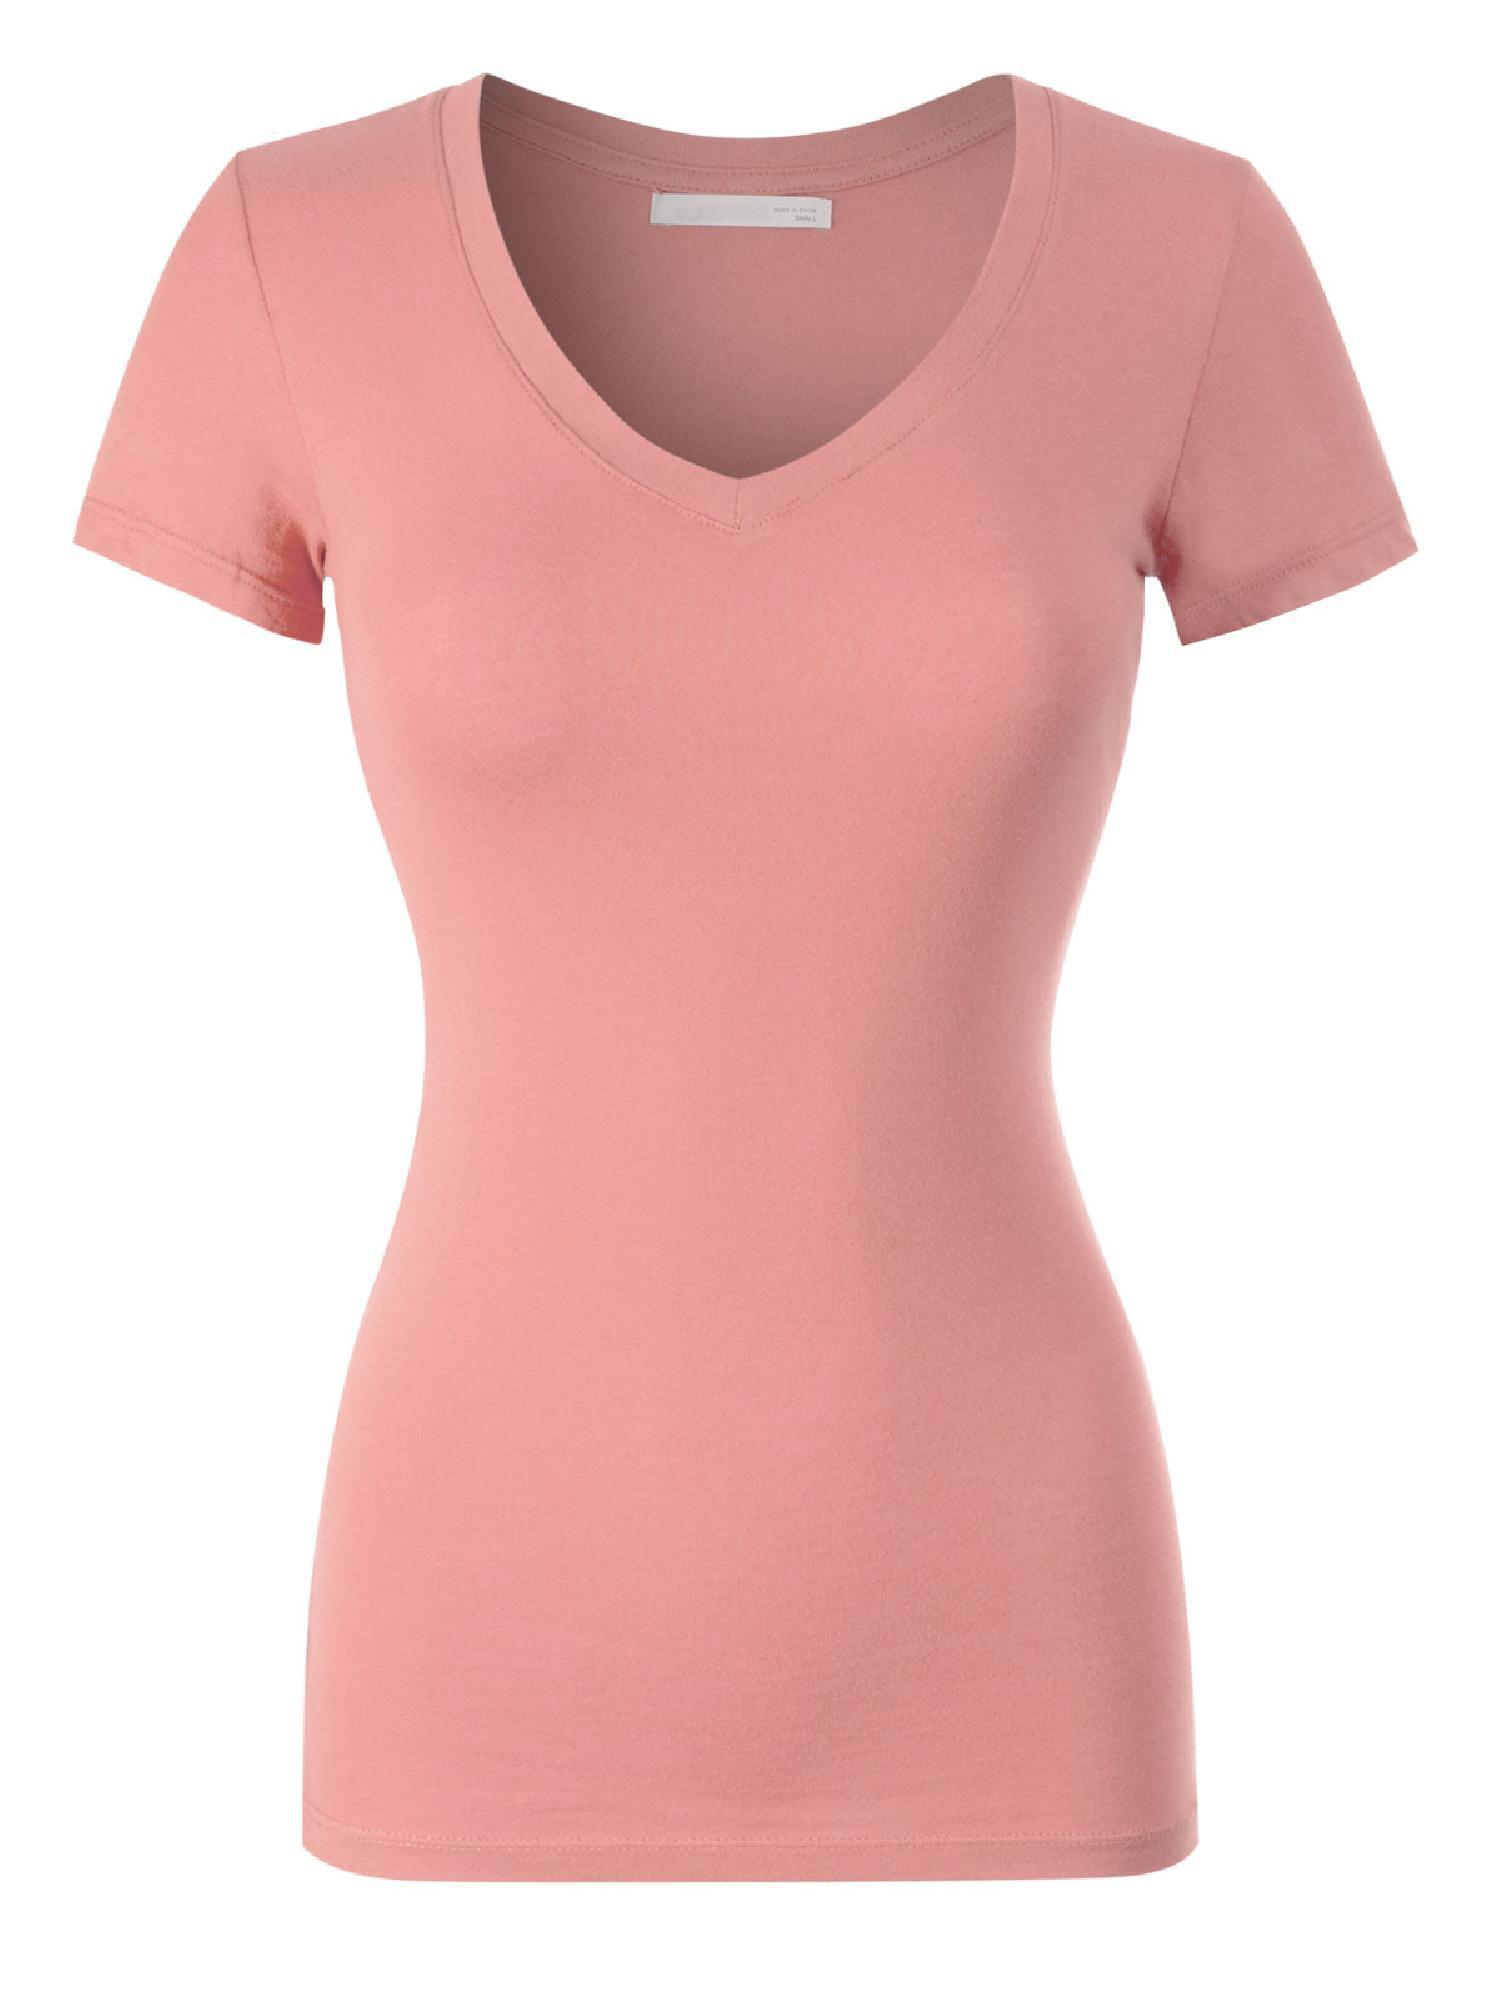 Plus Size Lingerie Night Shirt Sleepshirt Assorted Colors S 6X